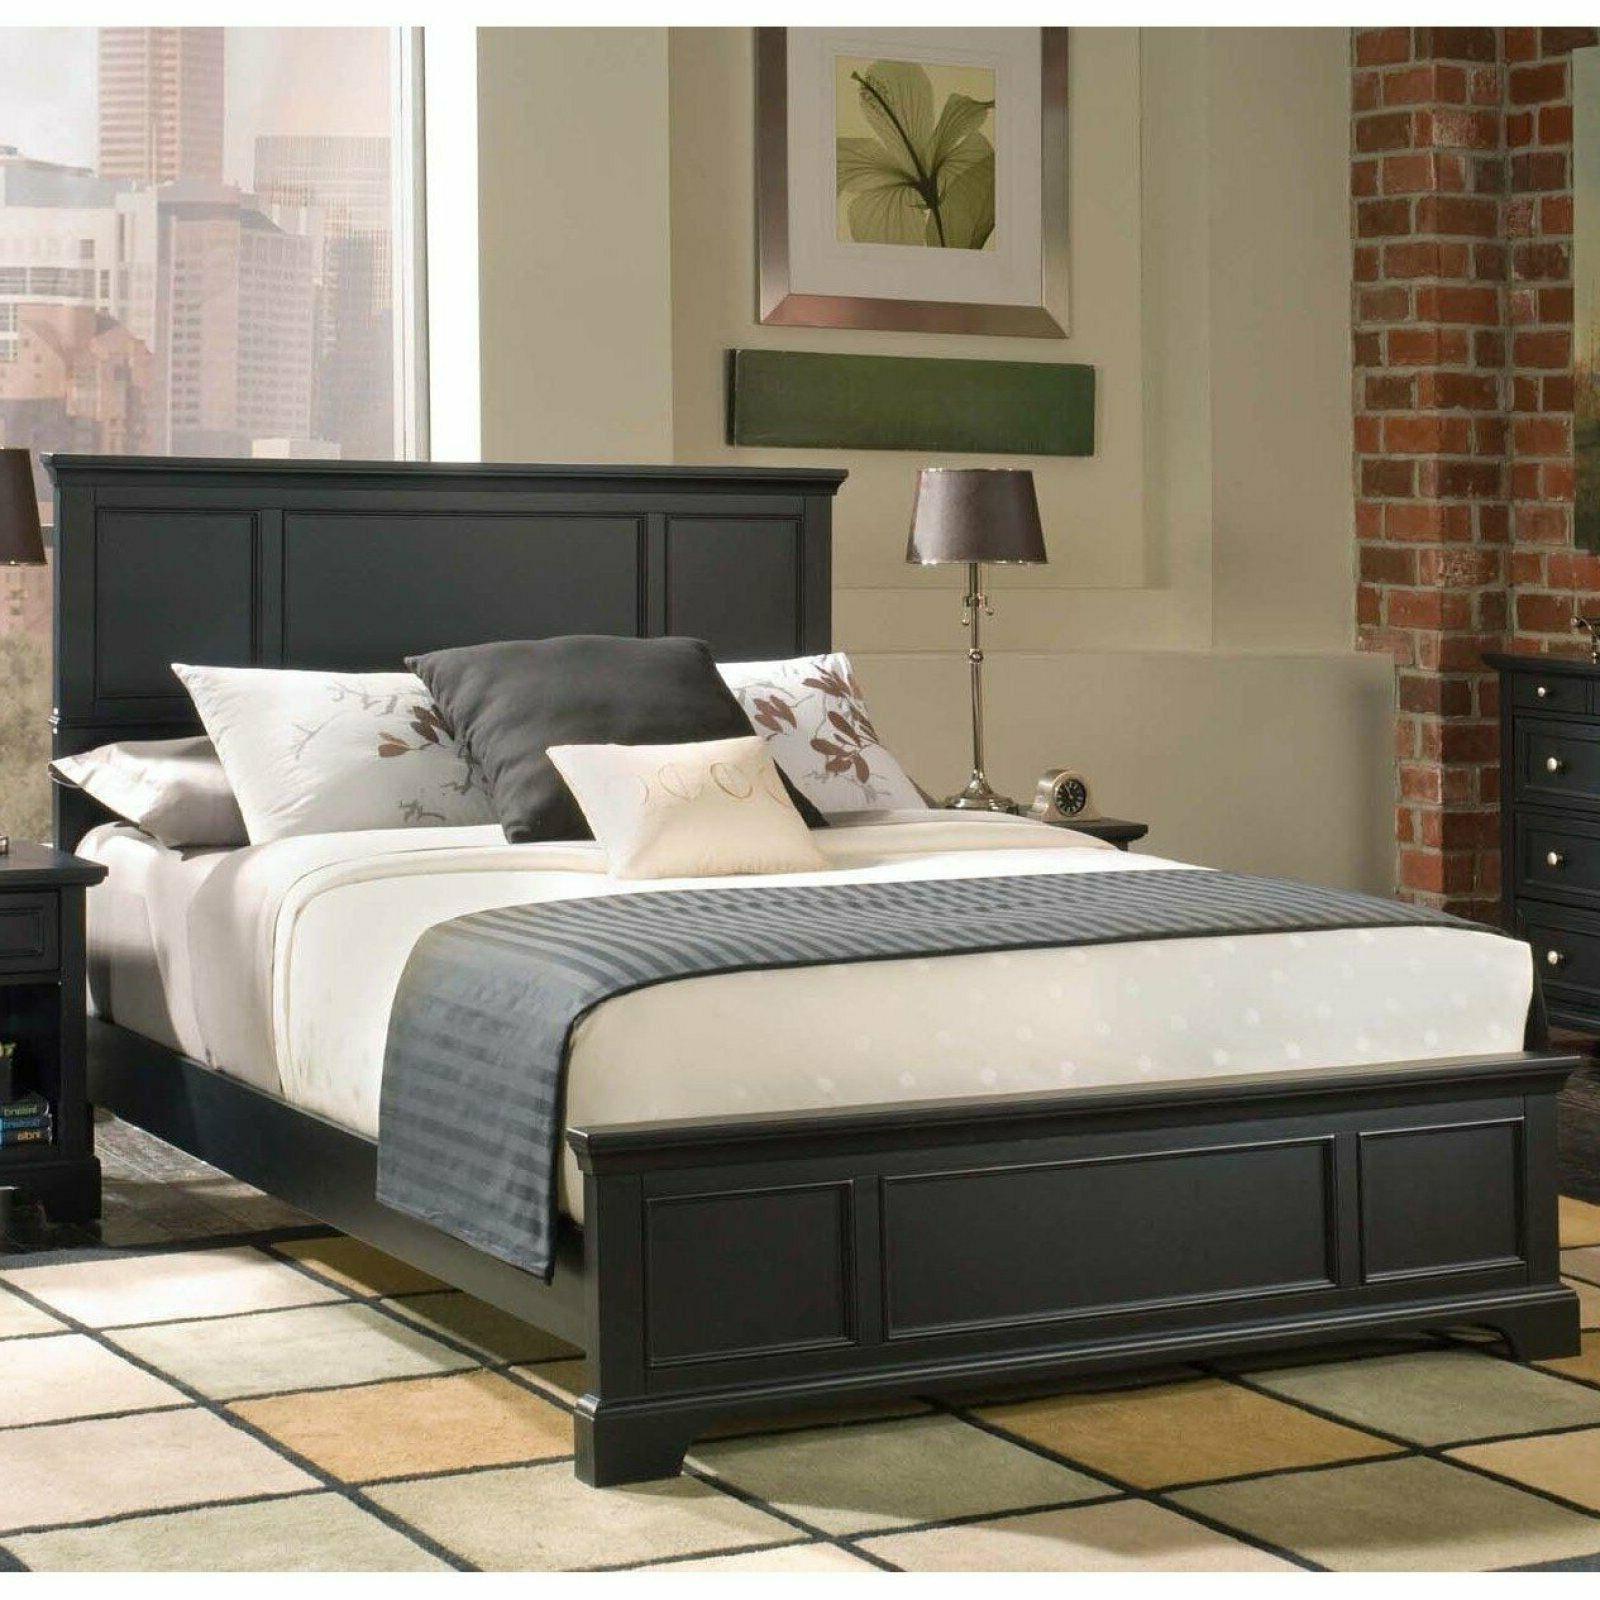 Queen Bed Frame Panel Black Finish Wood Bedroom Furniture Co